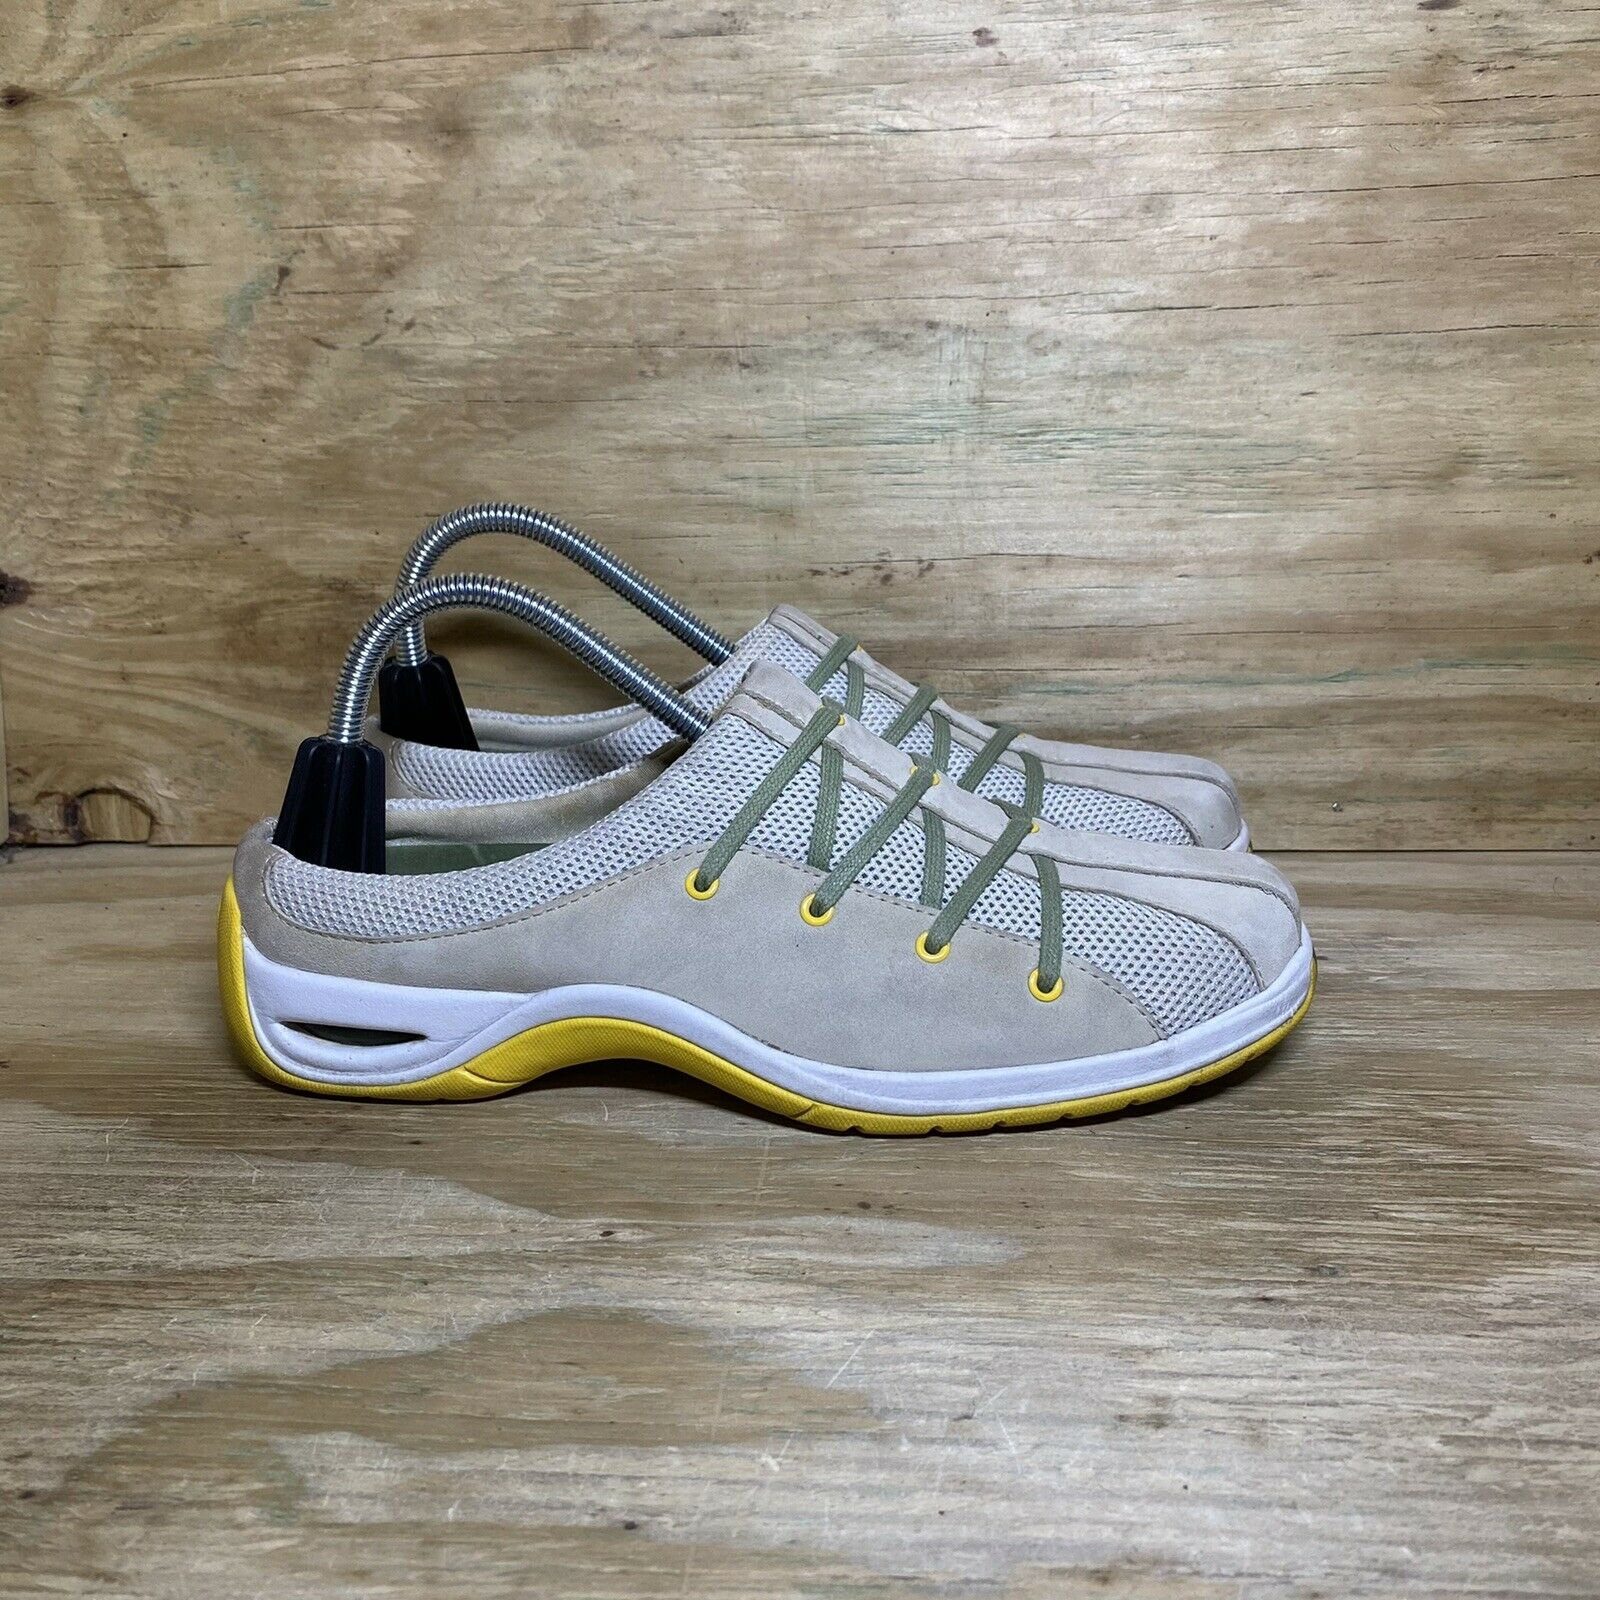 Cole Haan Air Mule Clog Shoes, Women's size 9, Tan